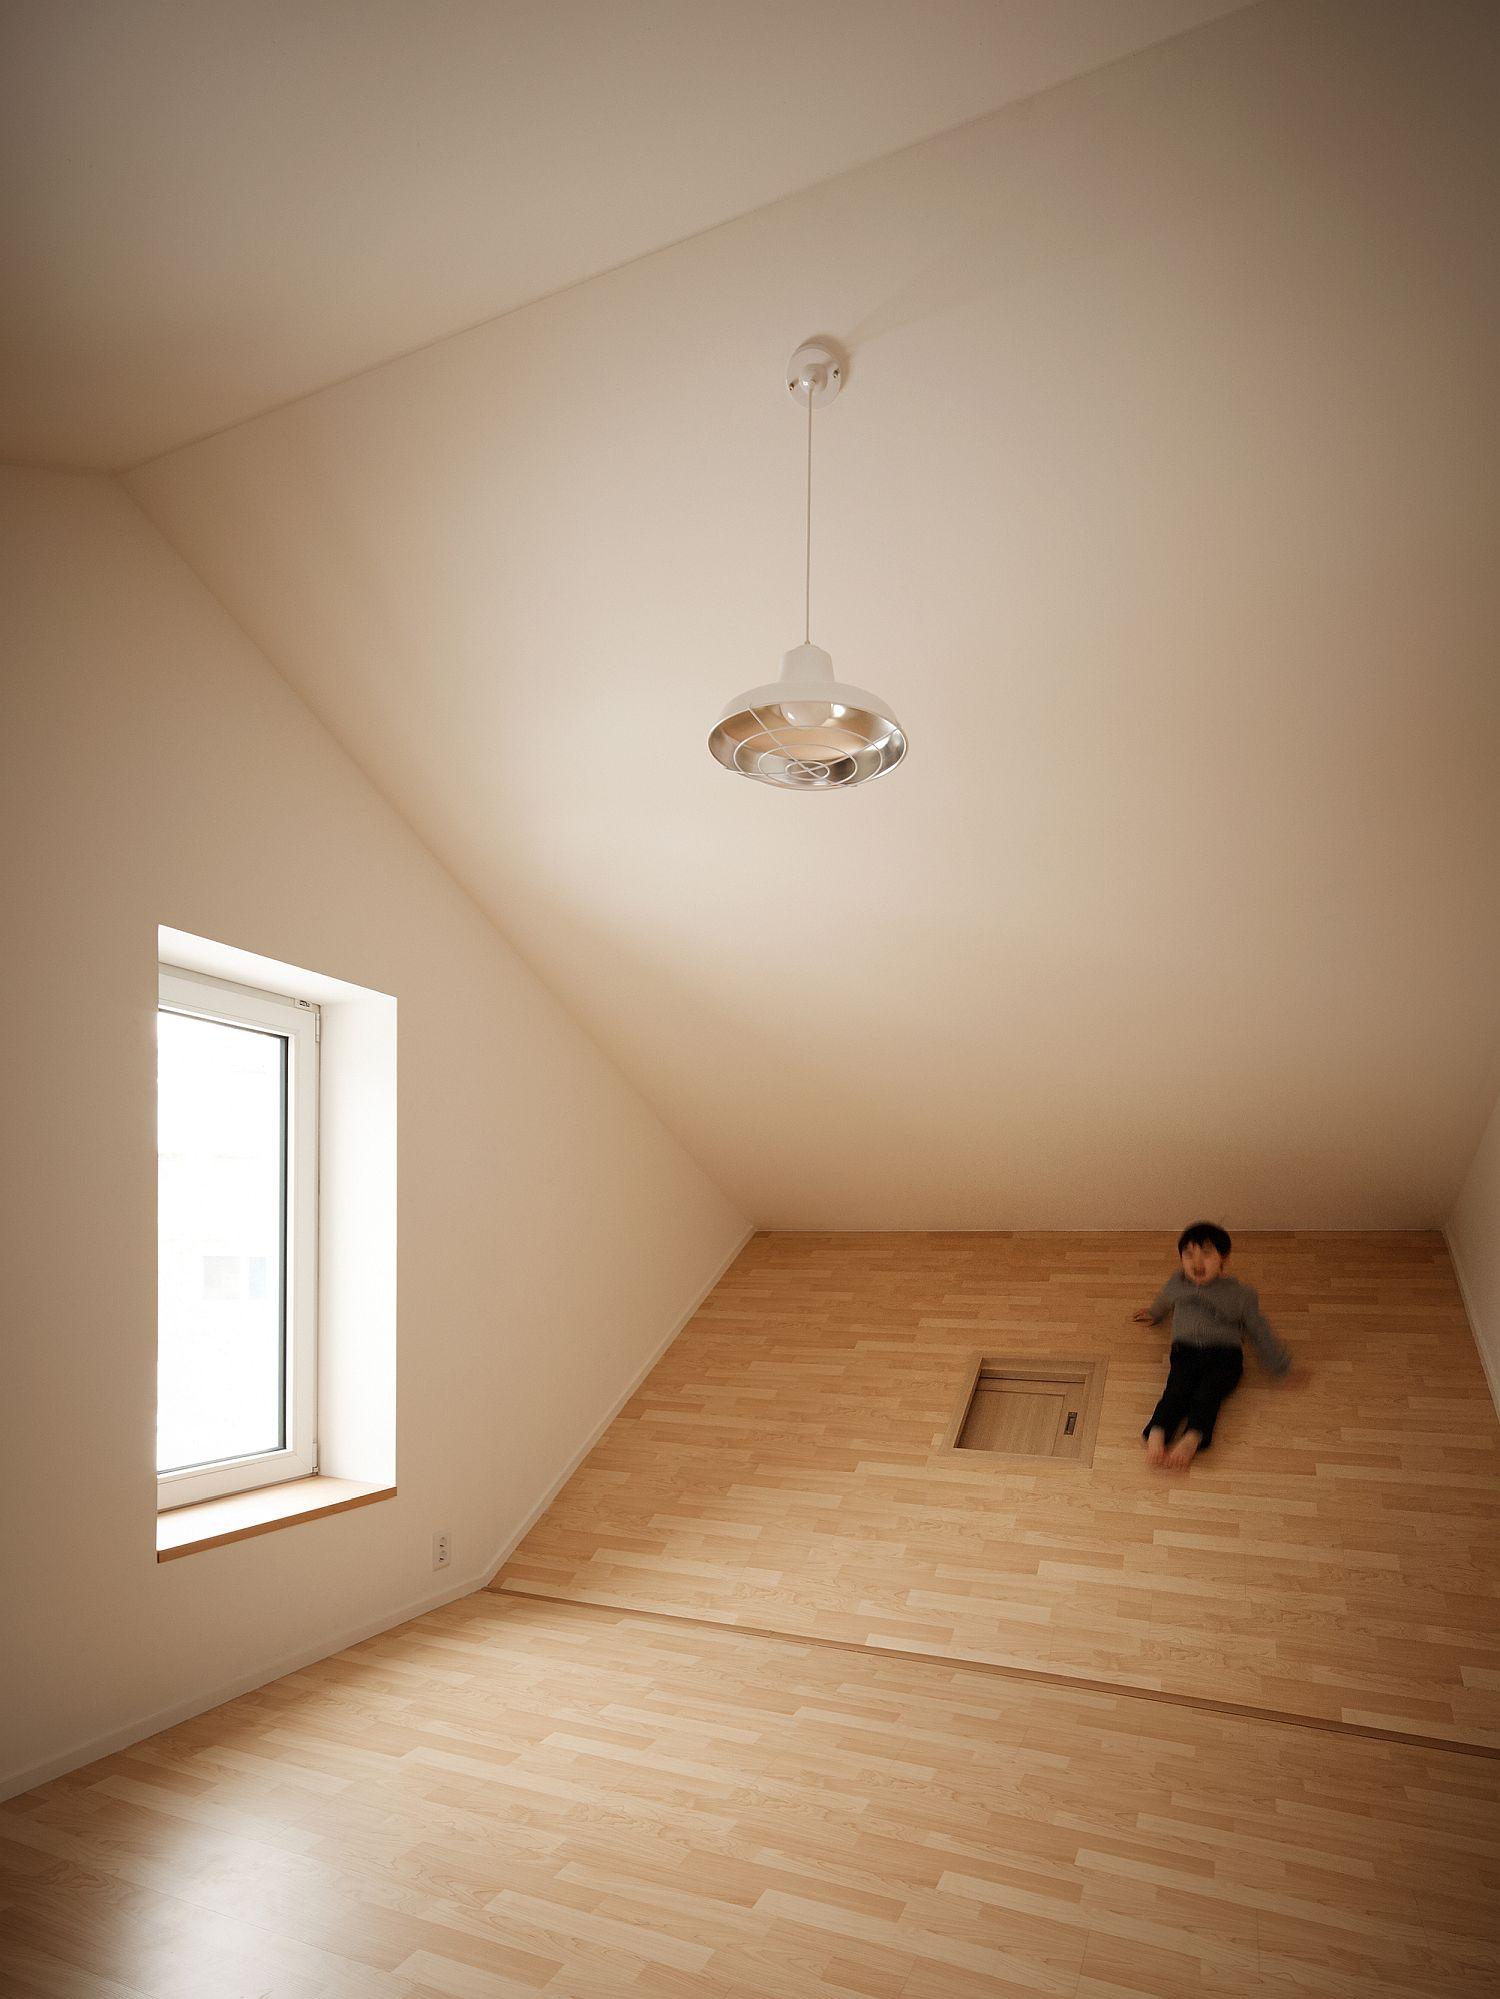 Upper level bedroom with a unique spatial arrangement